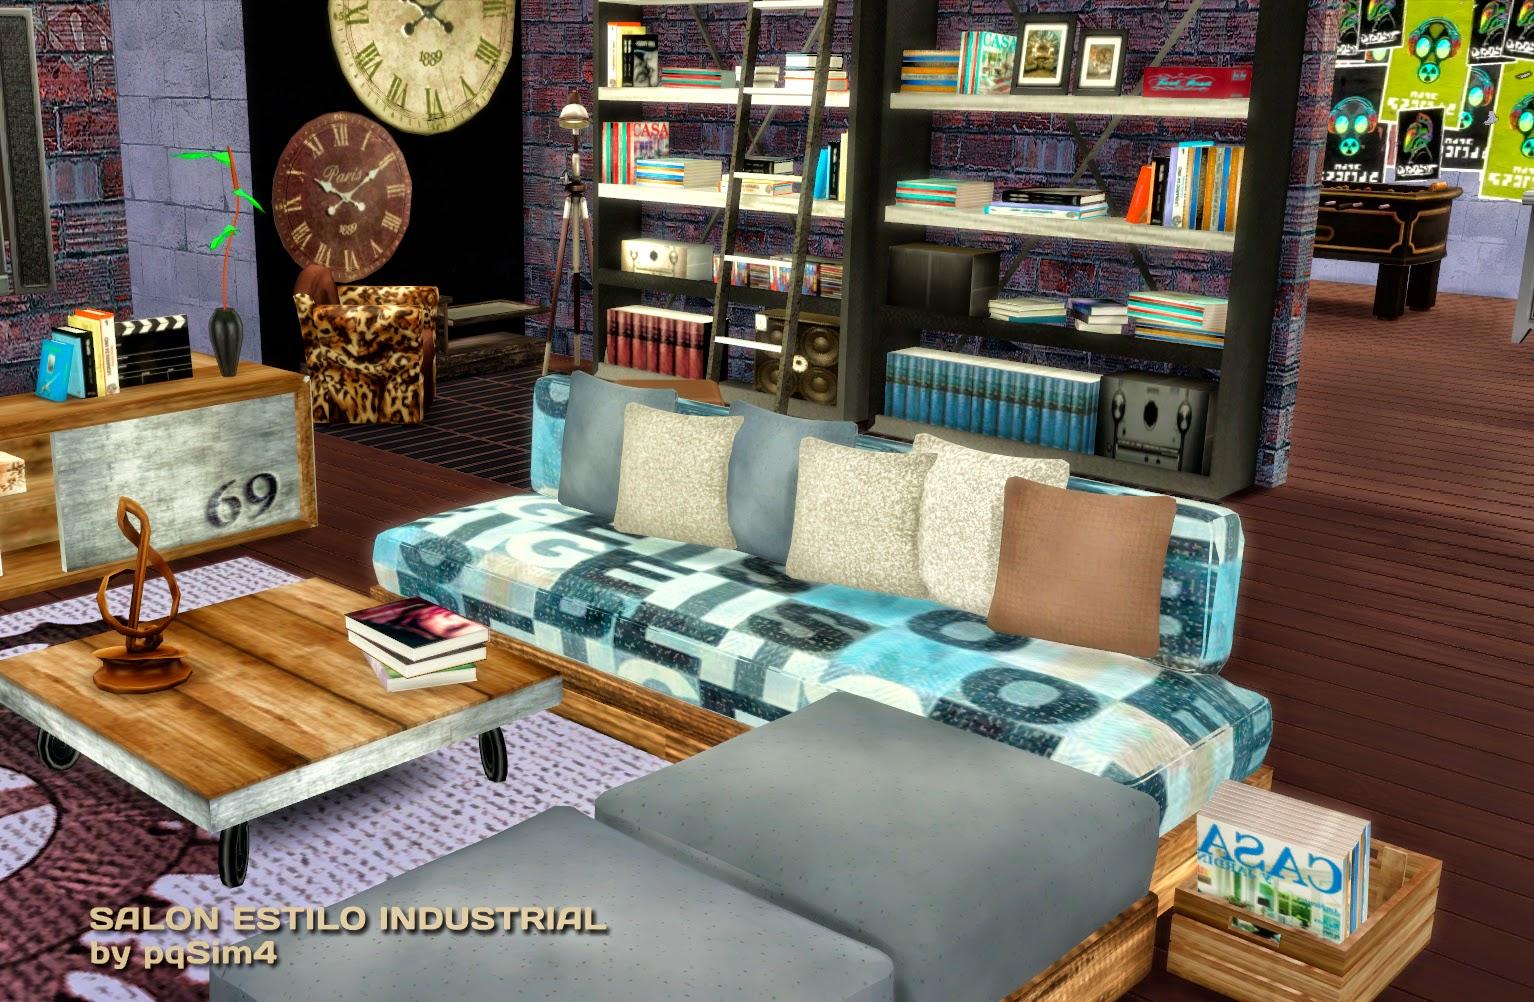 Sims 4 sal n estilo industrial - Salon estilo industrial ...